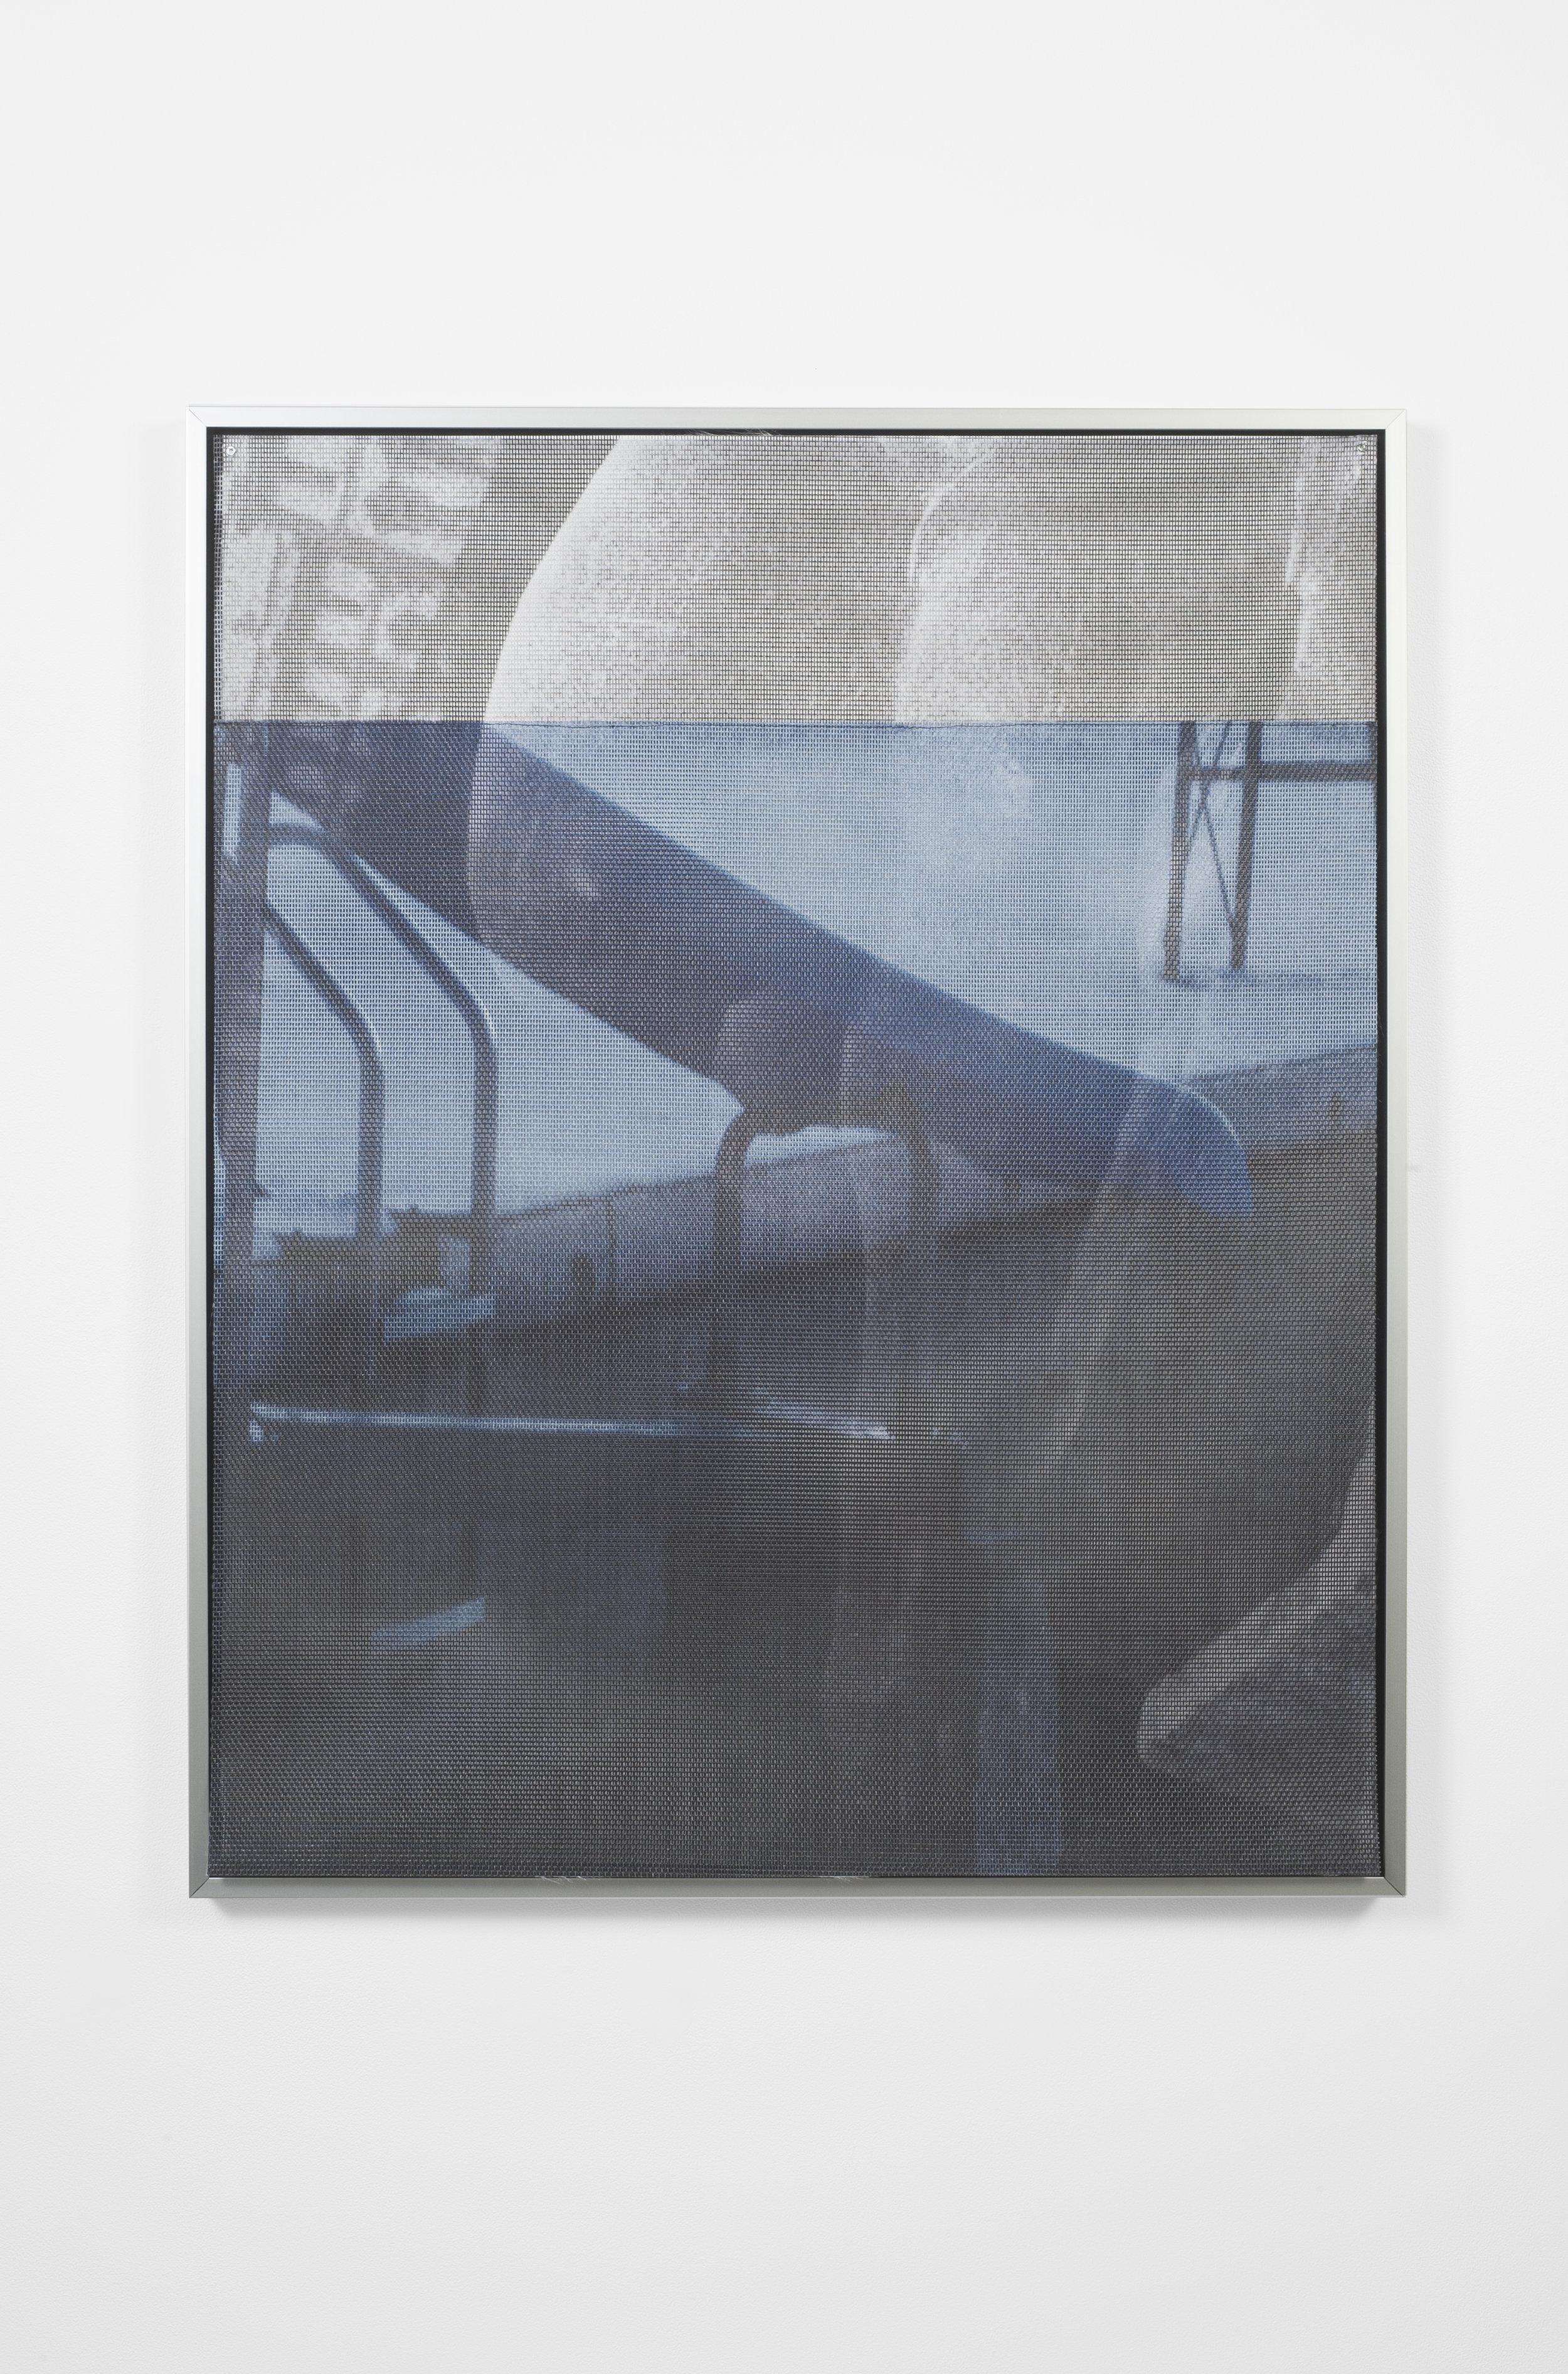 Ellie Hunter,  Syndrome of Subjective Doubles i,  2019, UV inkjet print on vinyl mesh, 24.4 x 31.5 inches